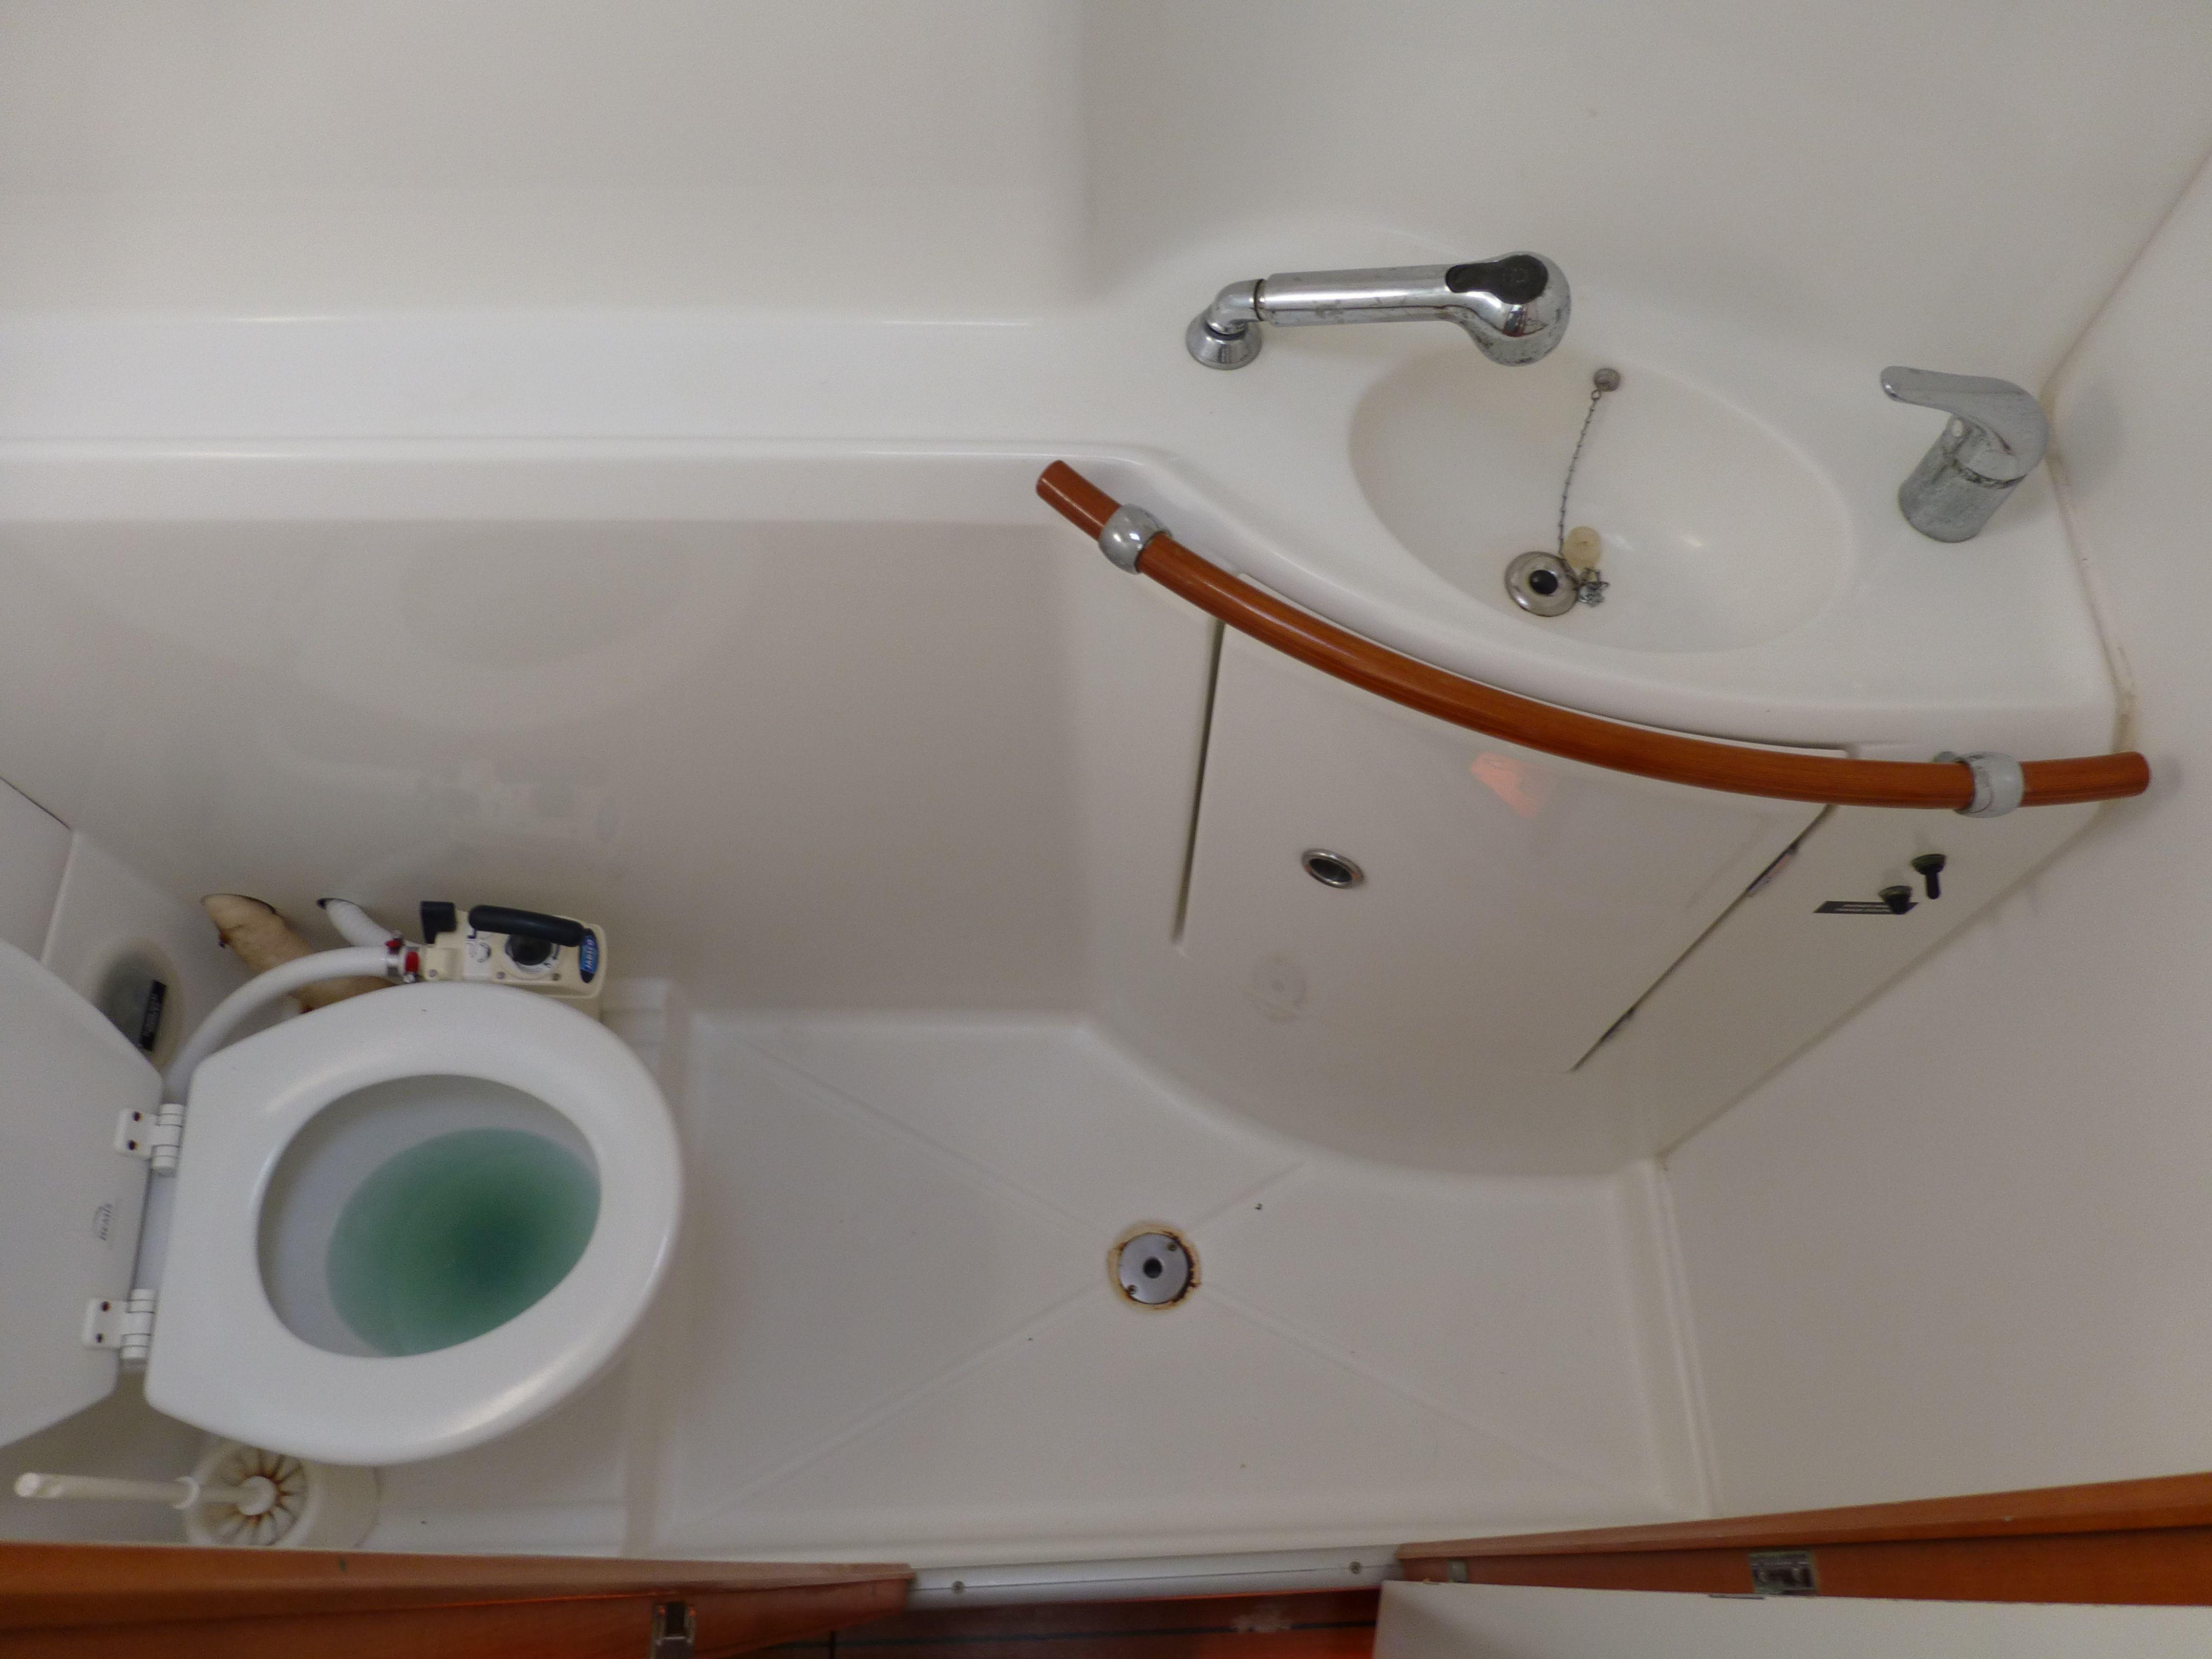 Lagoon 7 head  Boat interior, Small bathroom, Yacht interior